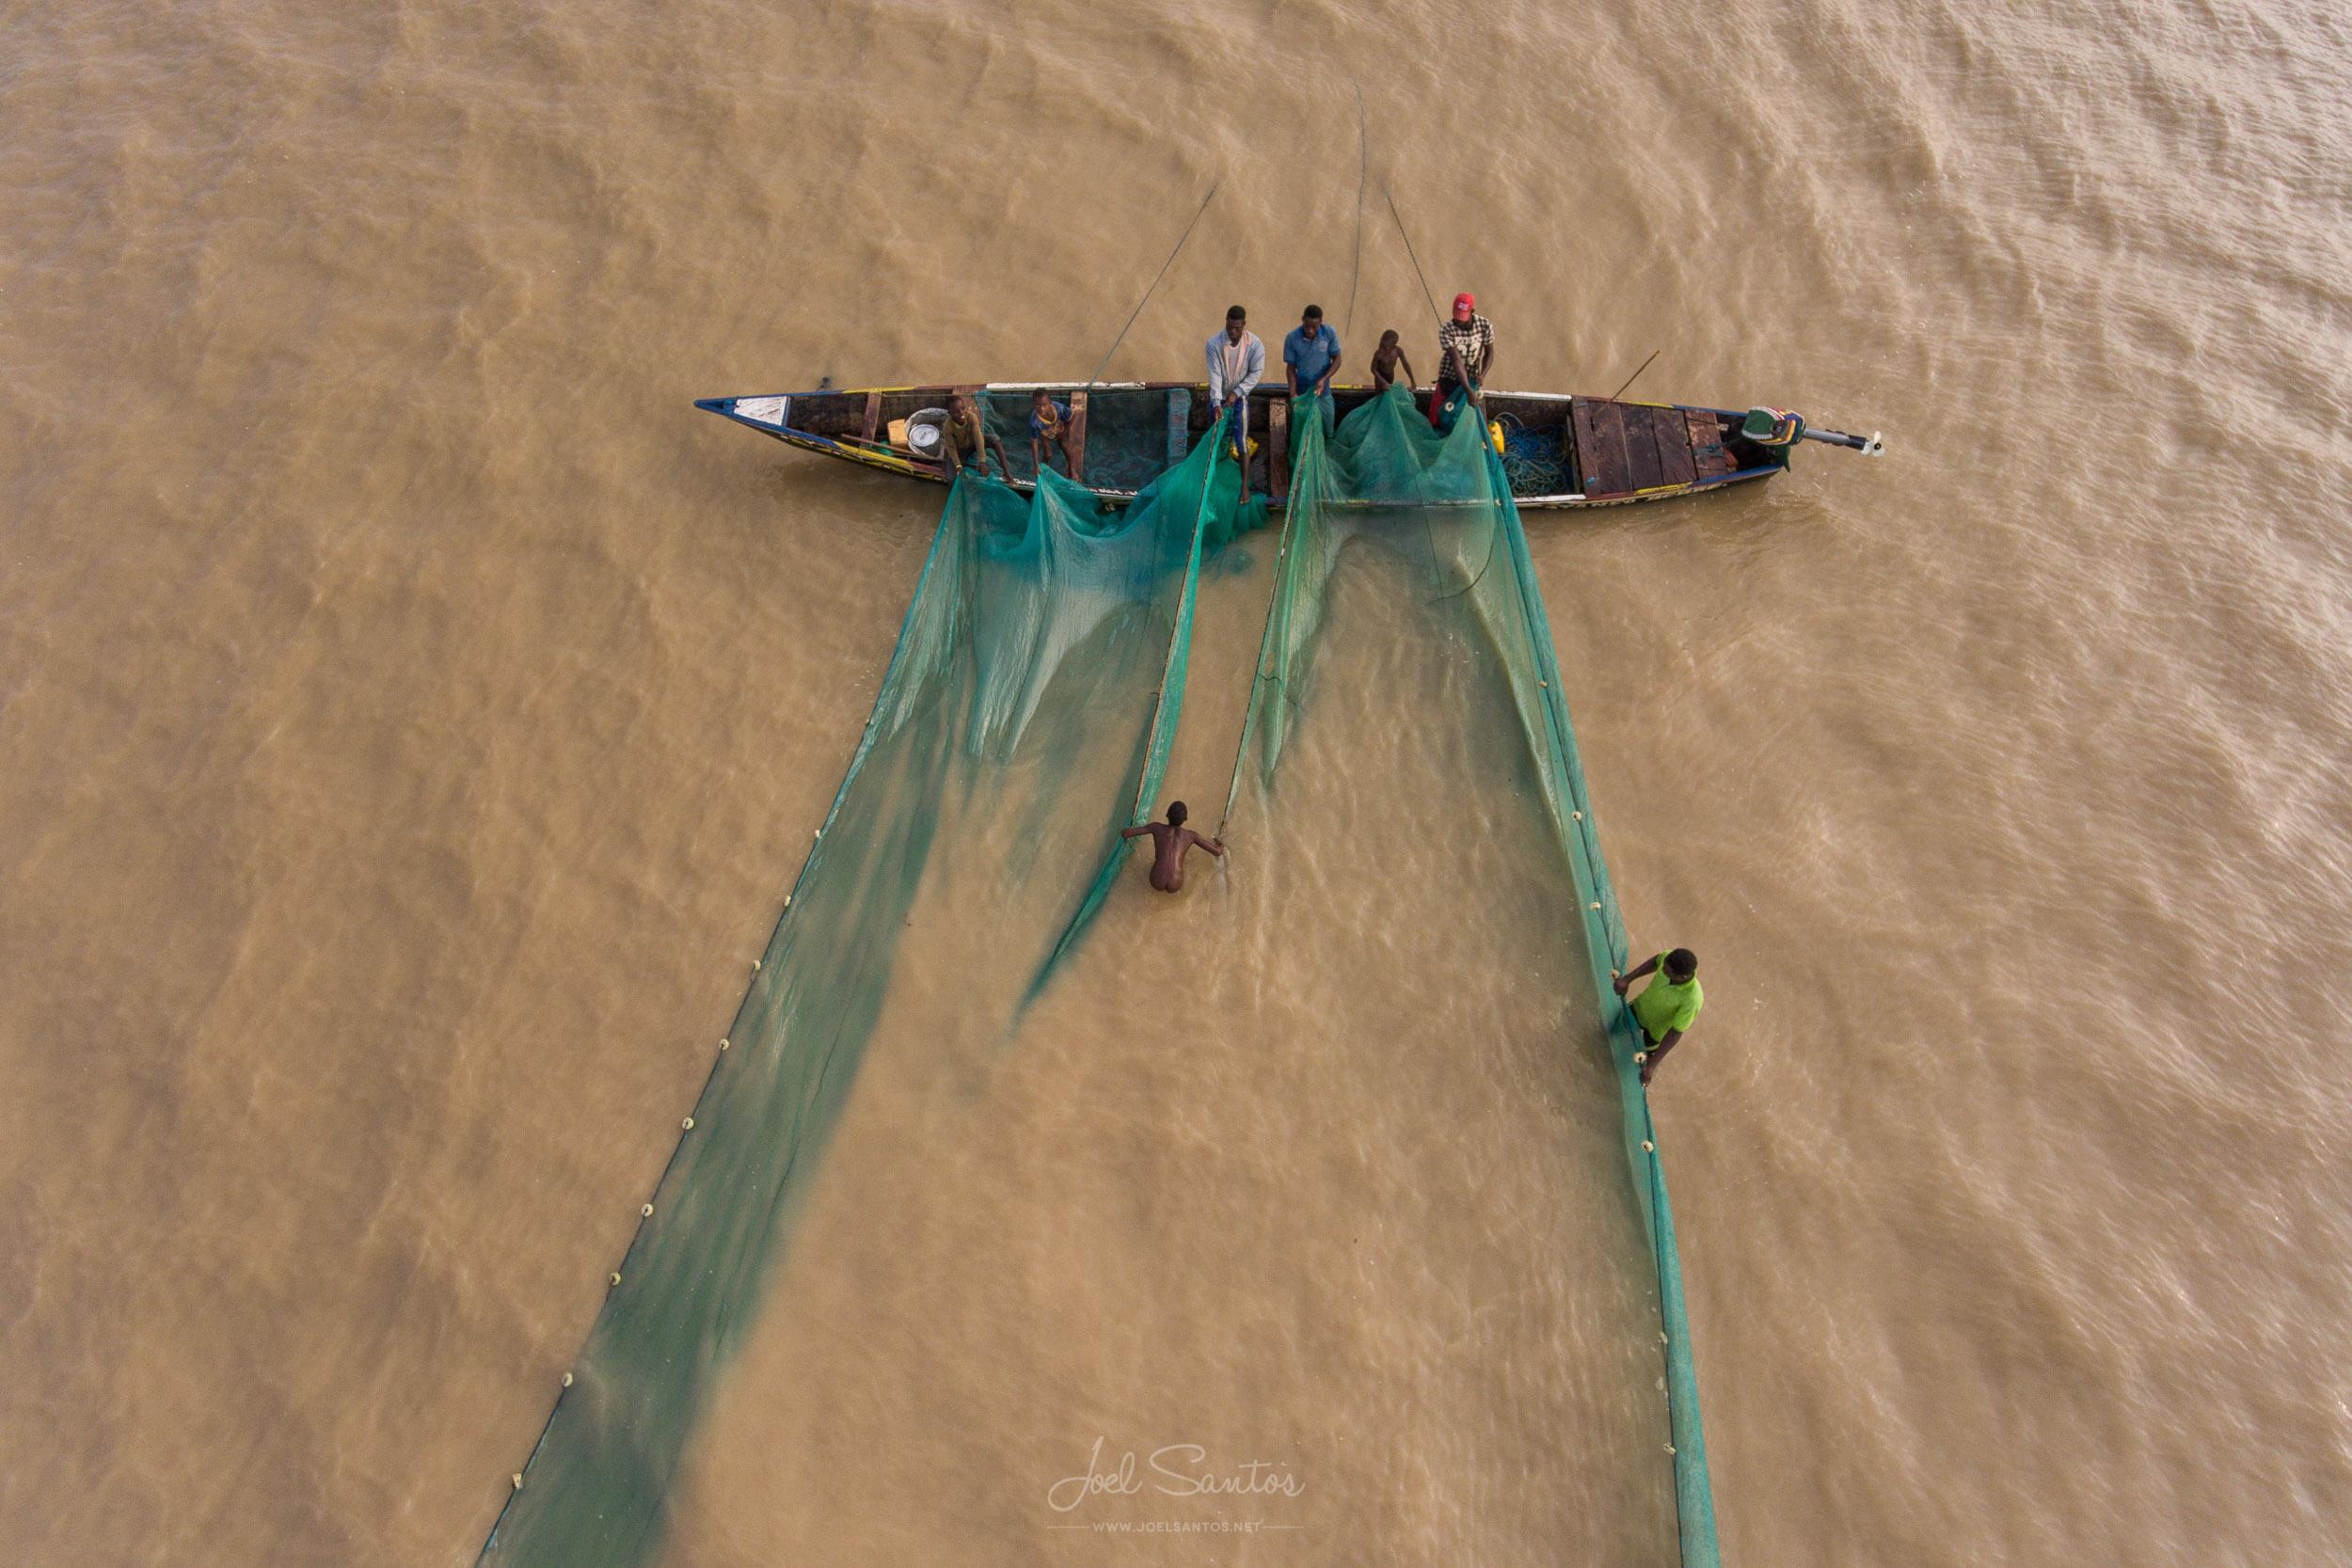 Lake Volta fishermen, Ghana